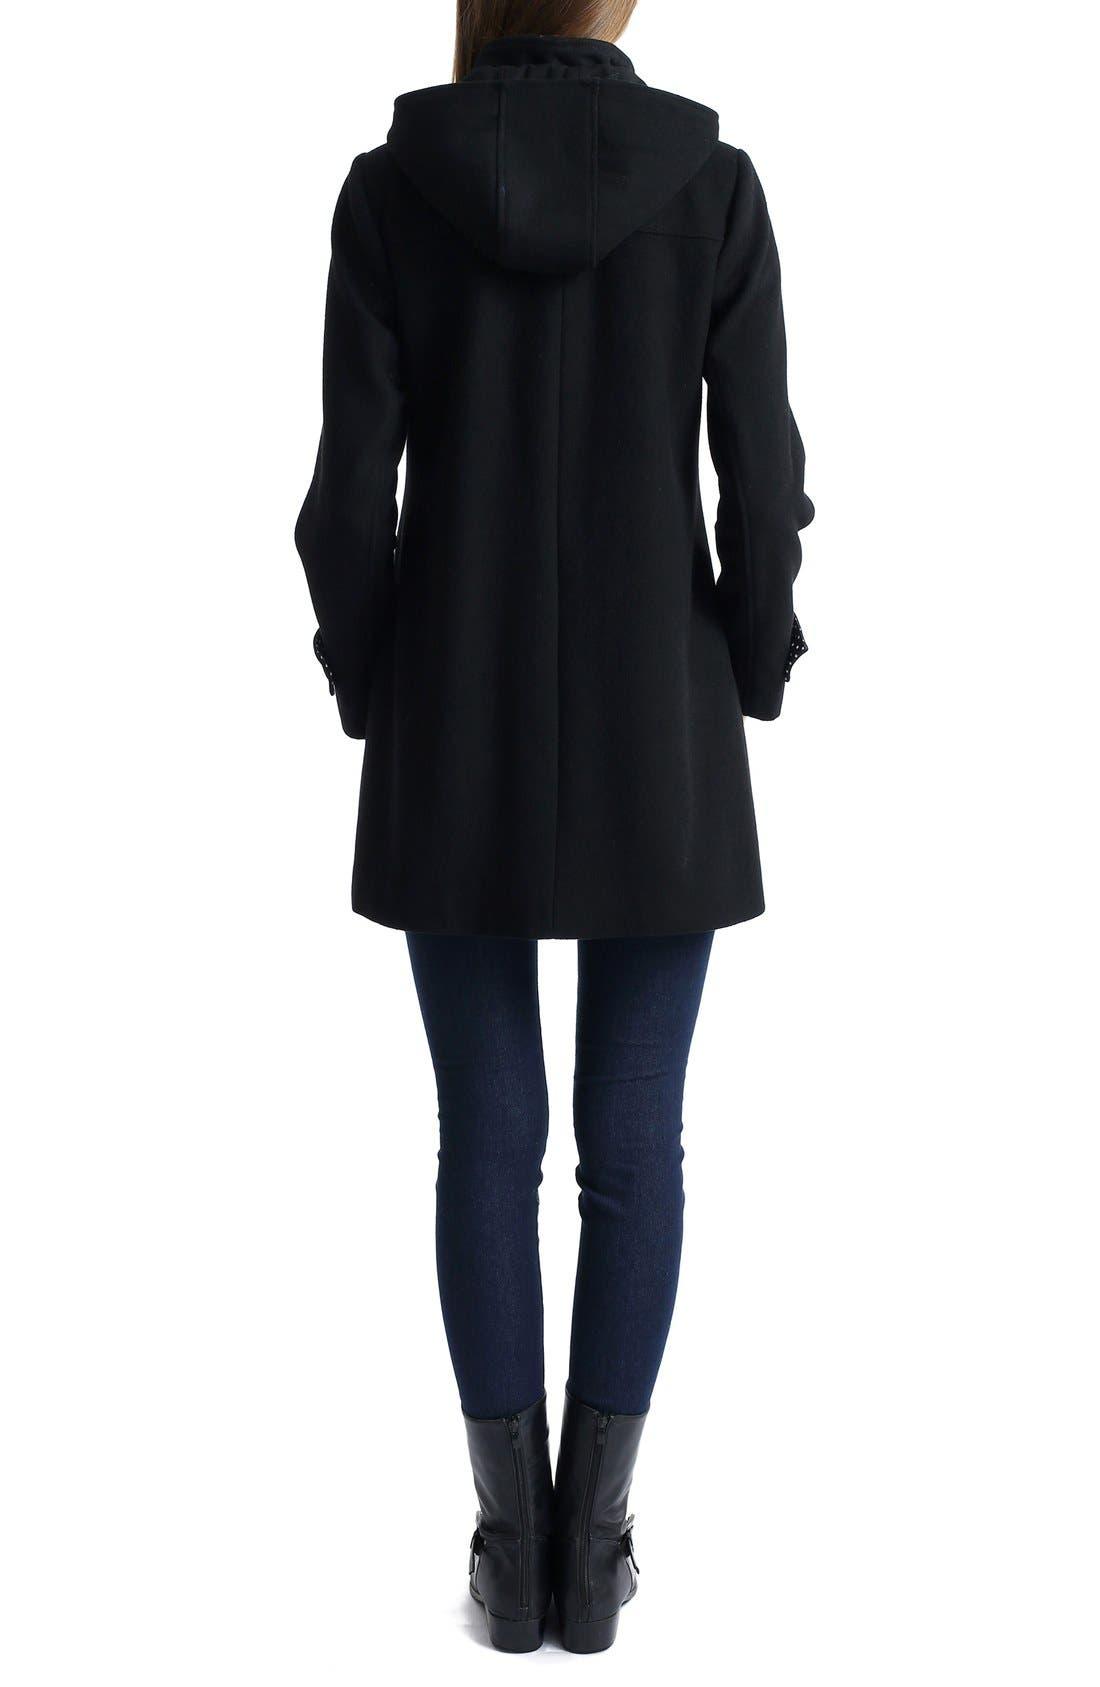 'Paisley' Maternity Duffle Coat,                             Alternate thumbnail 2, color,                             BLACK